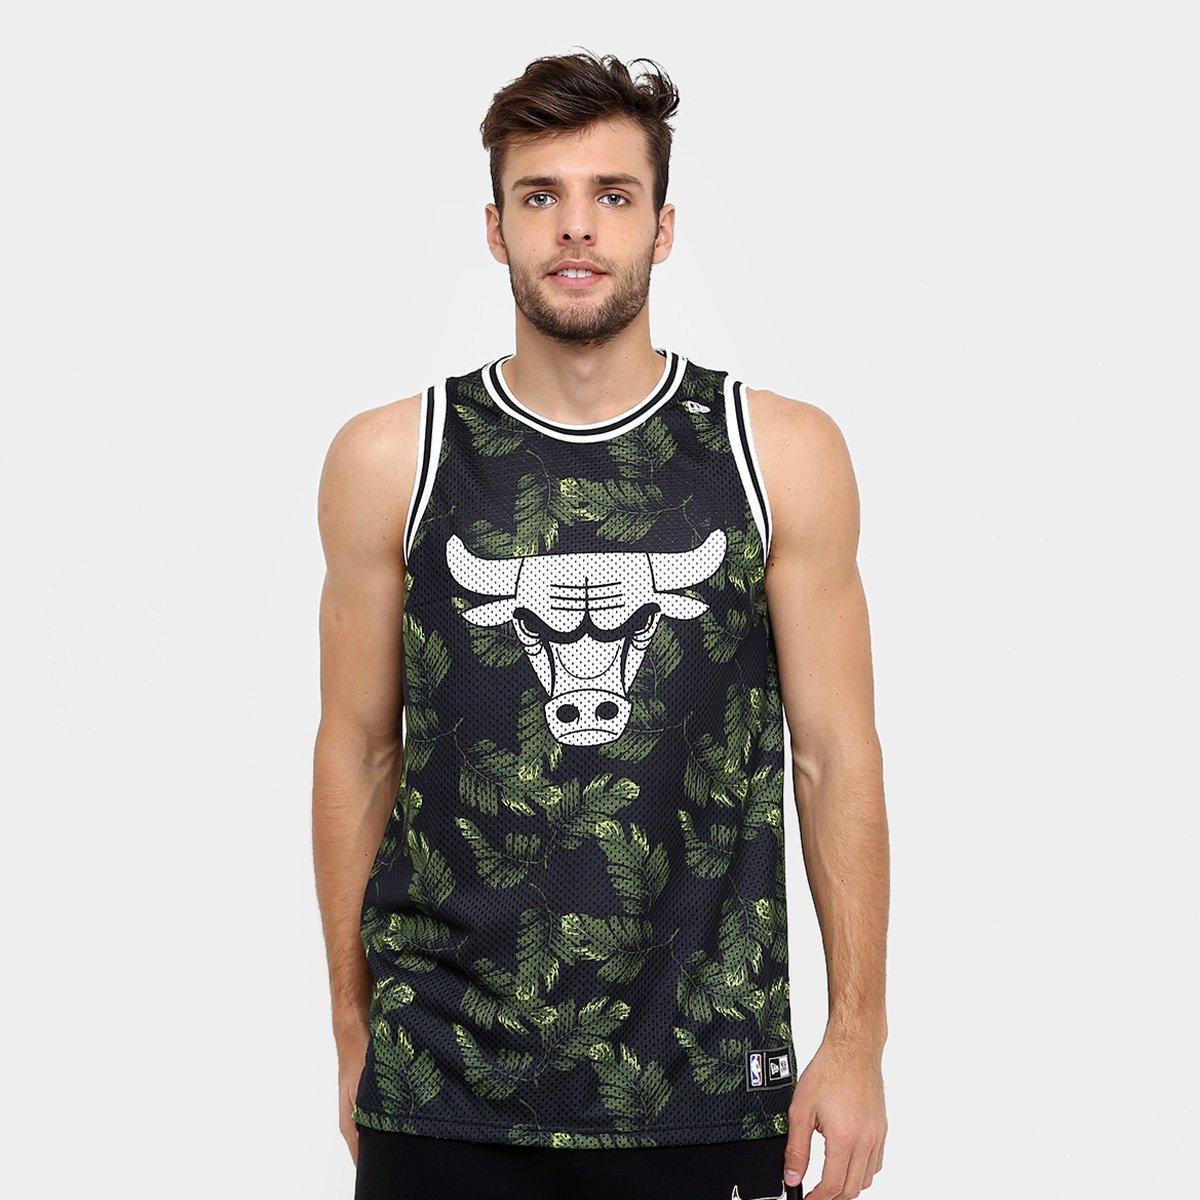 Camiseta Regata New Era NBA Jersey Palm Camo Chicago Bulls - Compre ... cec9c5cef29